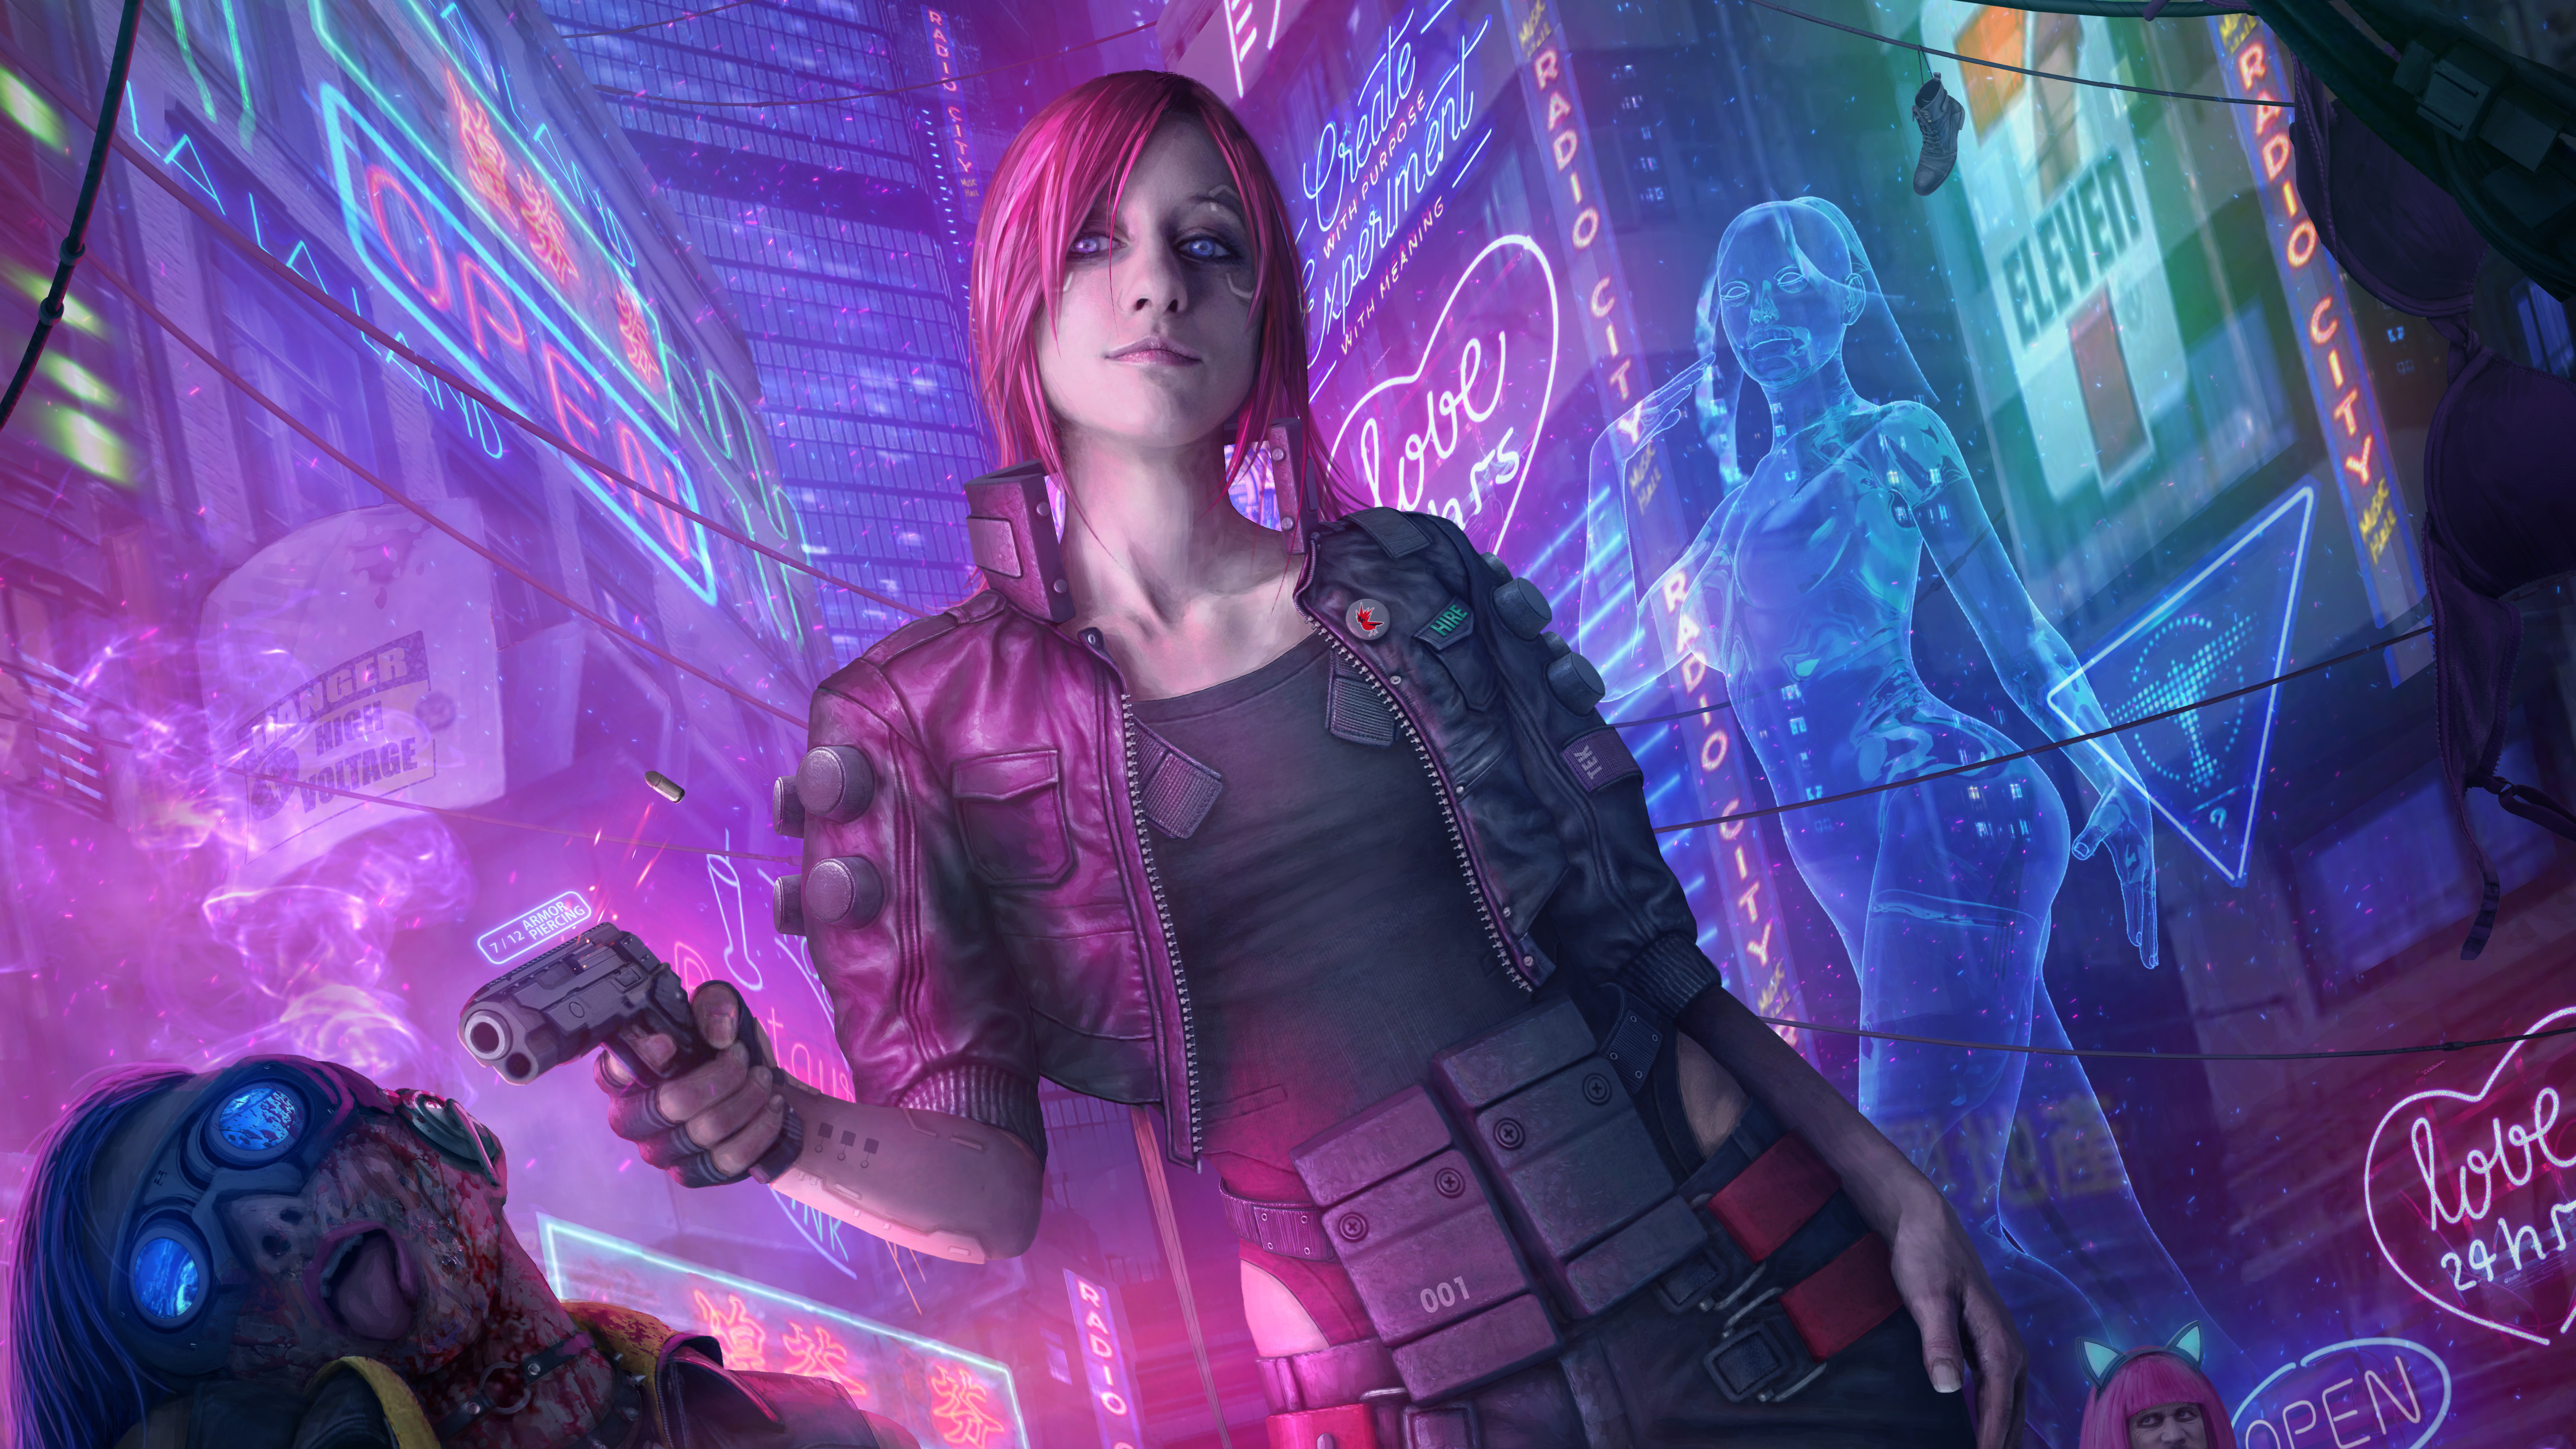 Cyberpunk 2077 Fanart 5k Hd Artist 4k Wallpapers Images